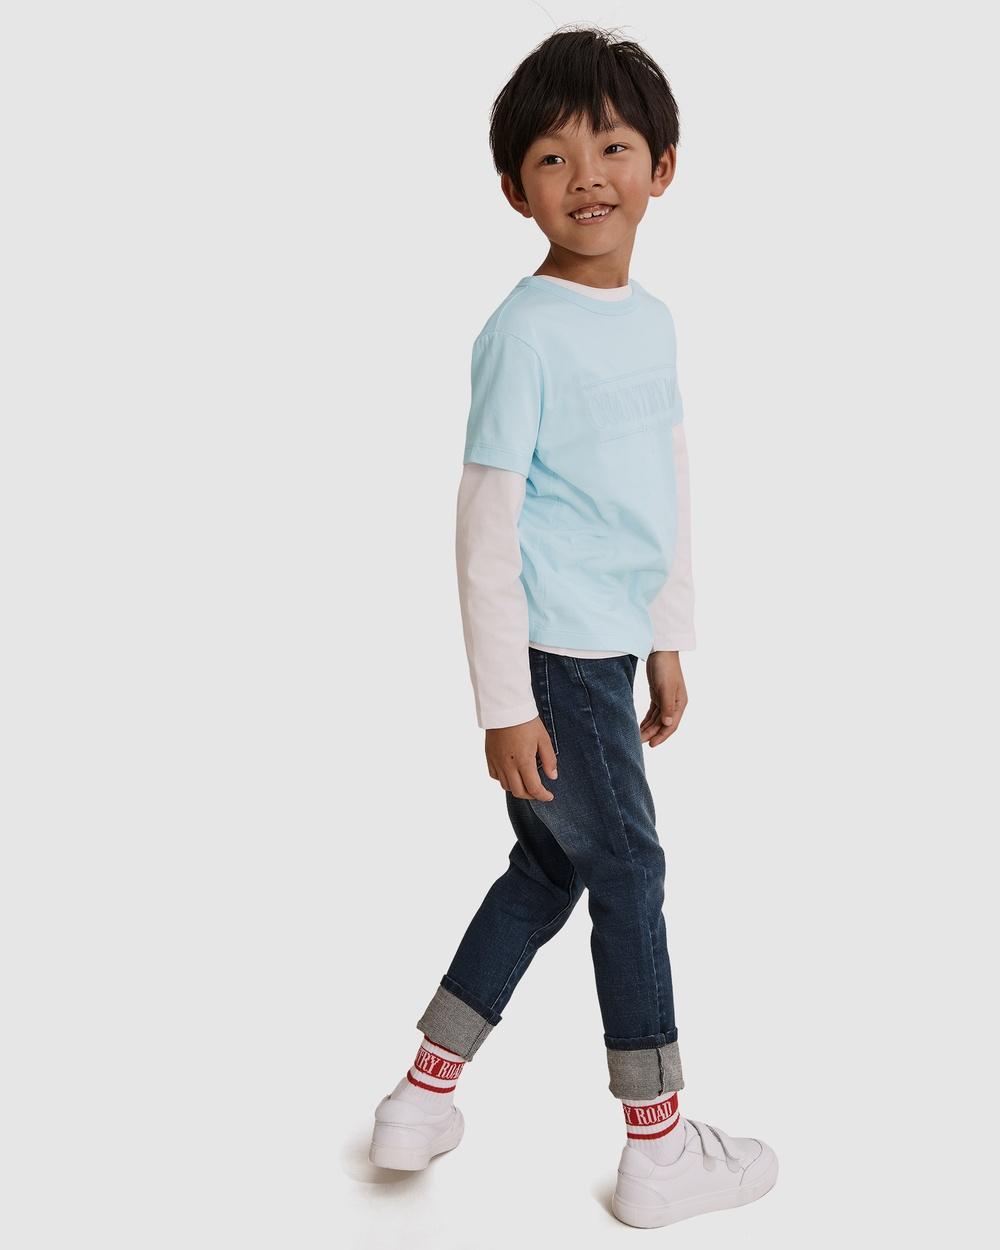 Country Road Verified Australian Cotton Heritage T shirt T-Shirts & Singlets blue T-shirt Australia